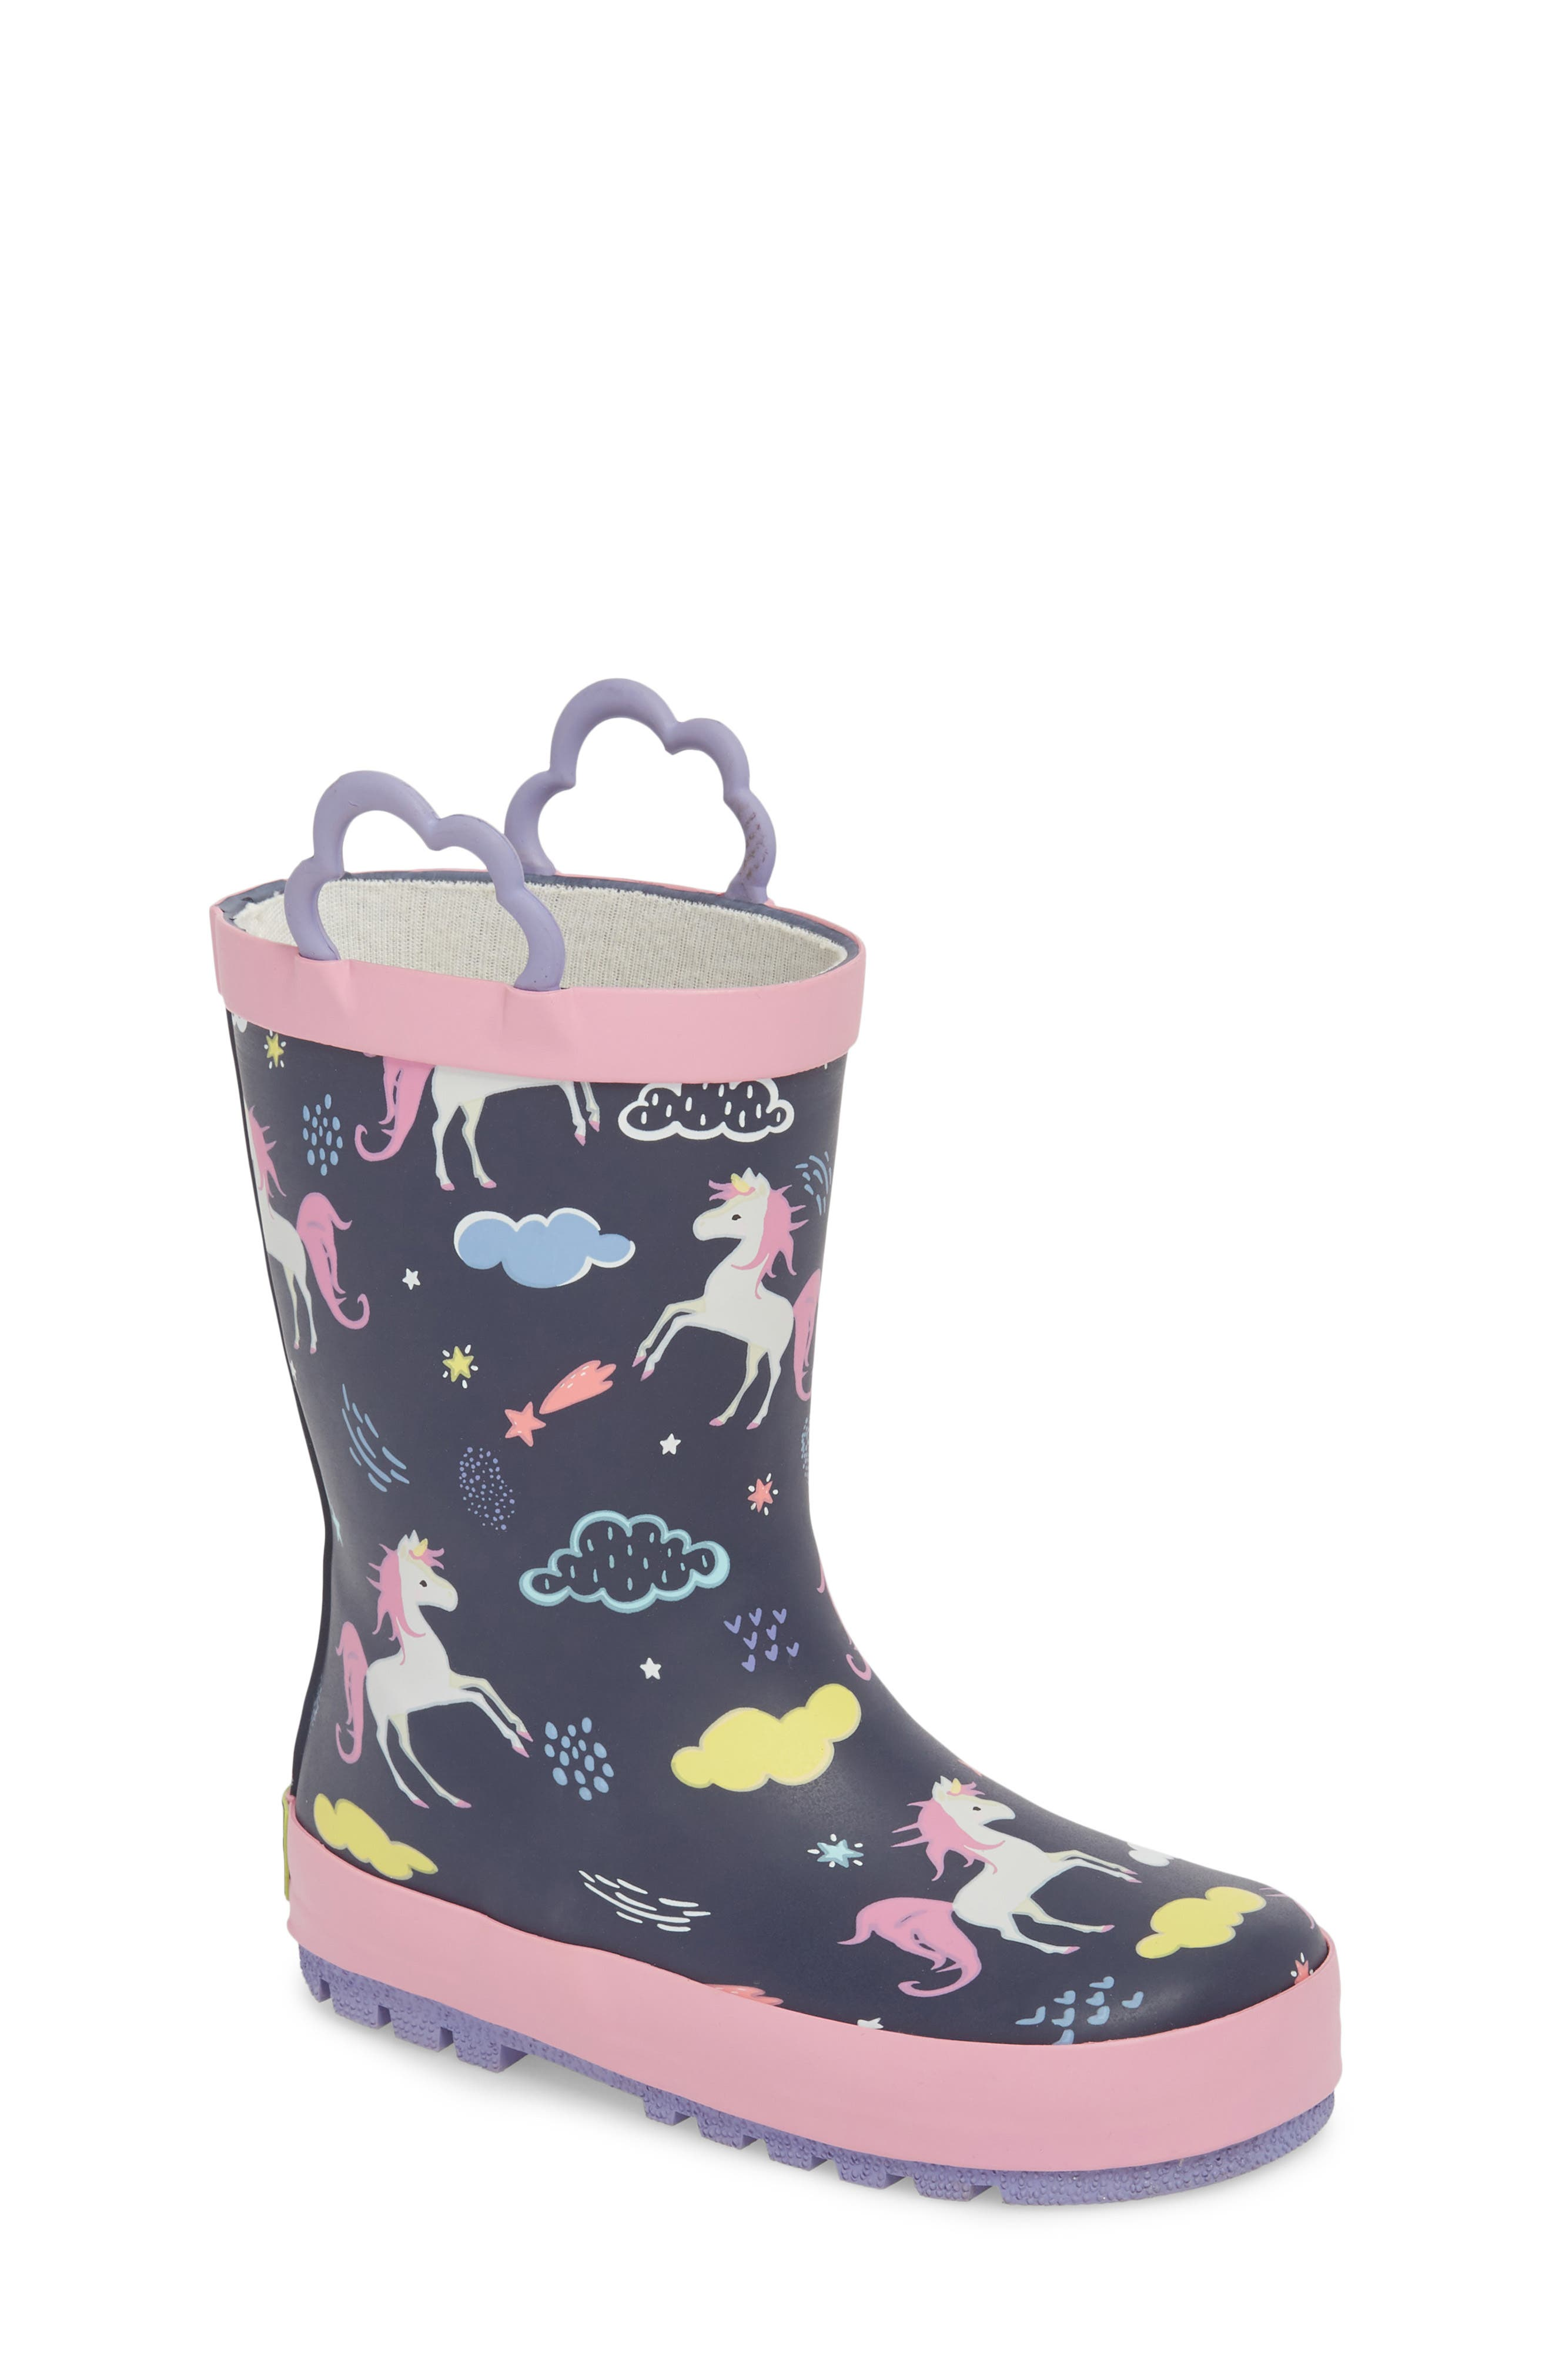 Unicorn Play Waterproof Rain Boot,                         Main,                         color, 421